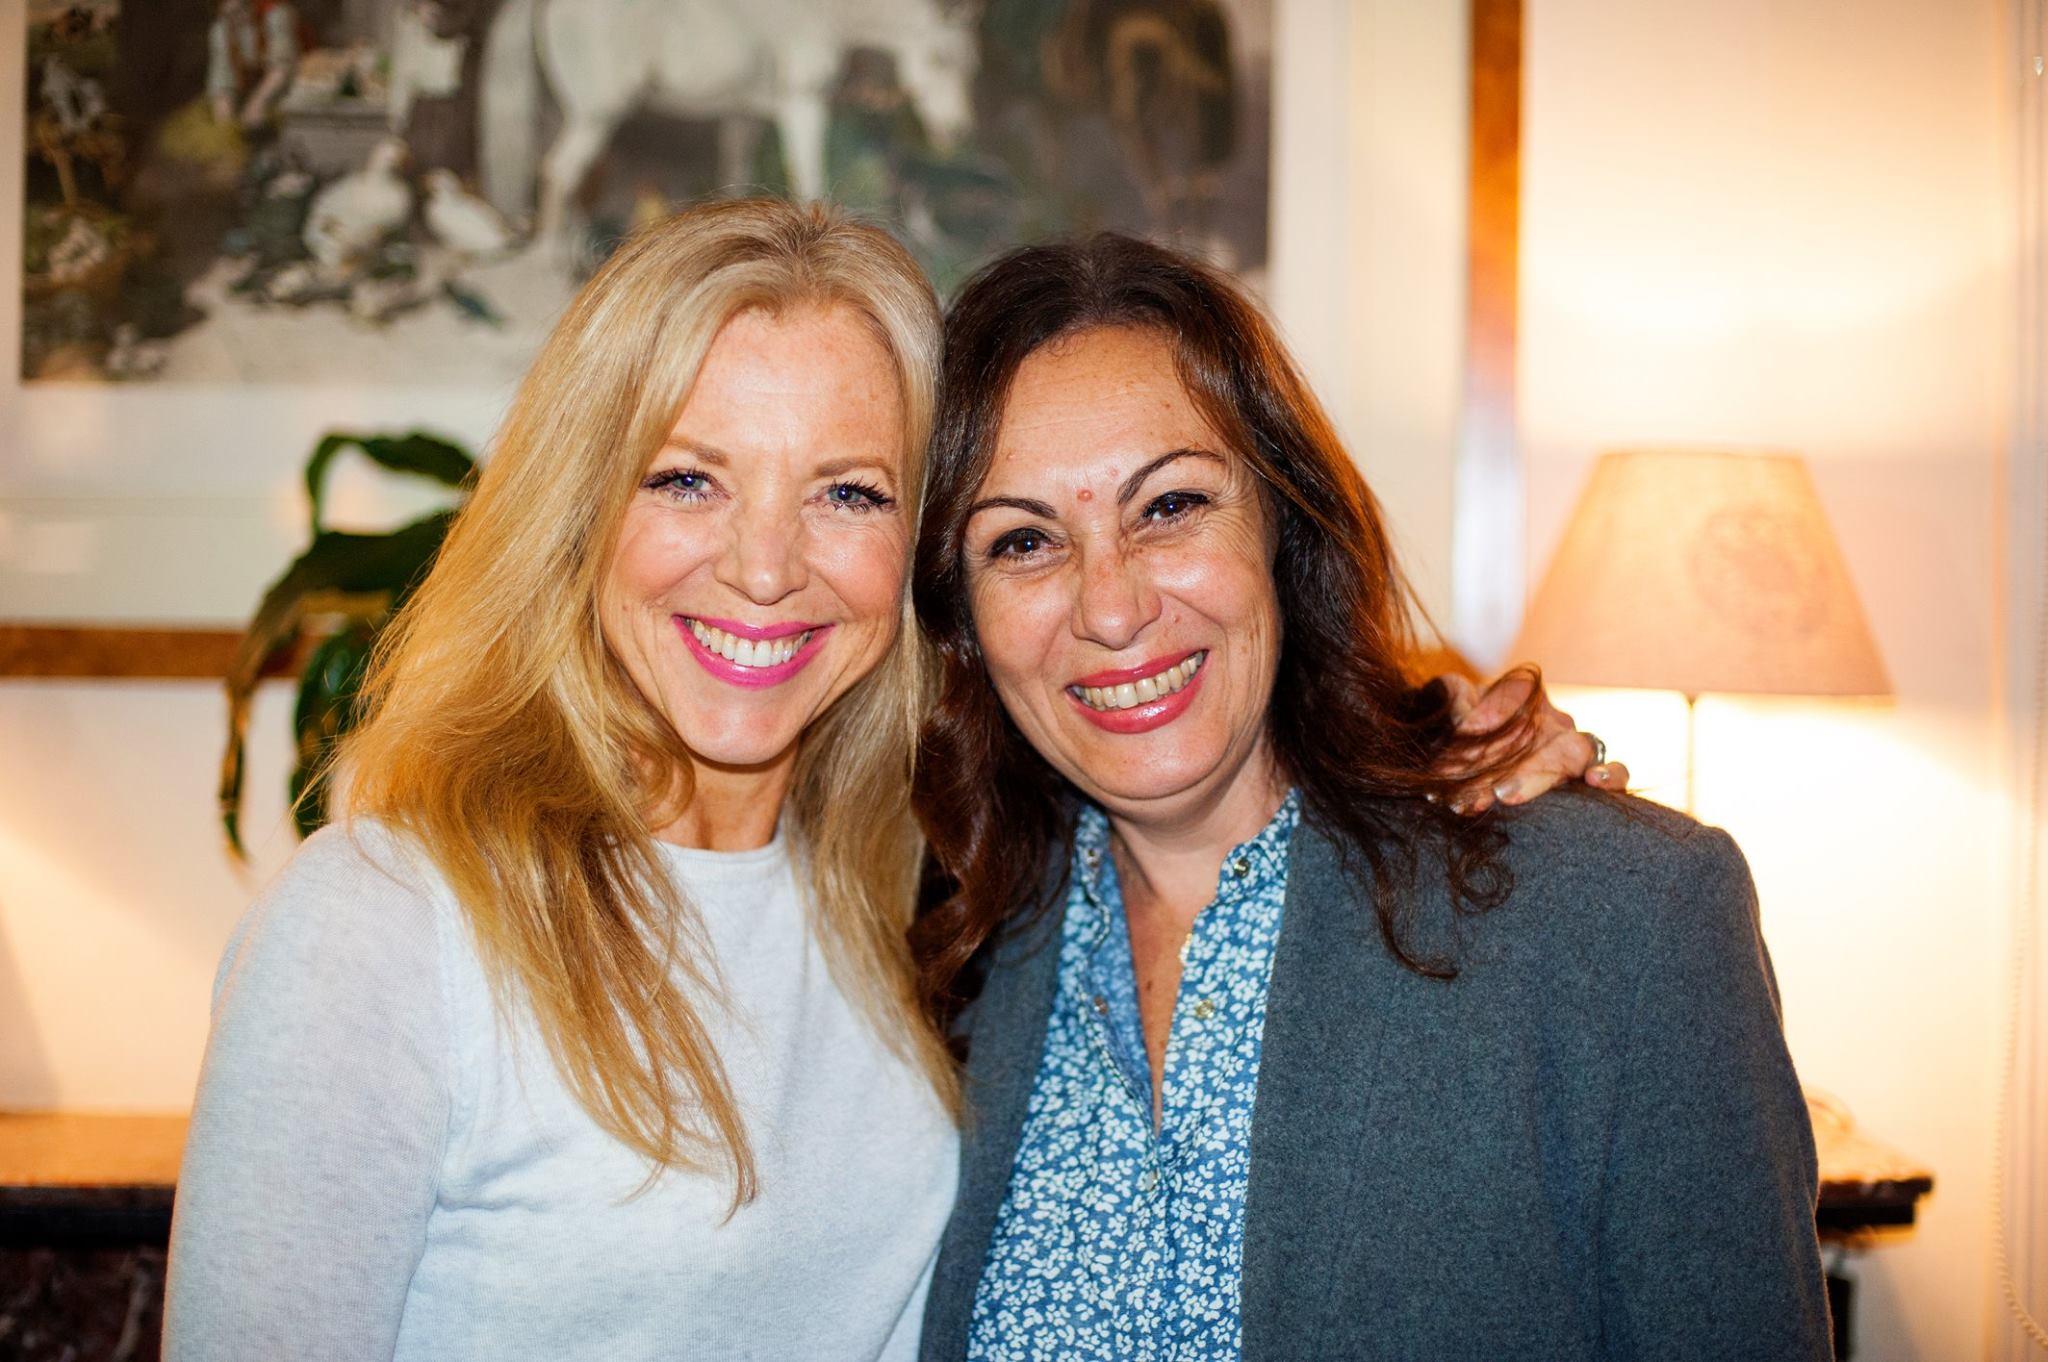 Super talented creative mamas Lynette de la Vega and Ava Yvonne Coburn at our Creative Mama Evening Talk